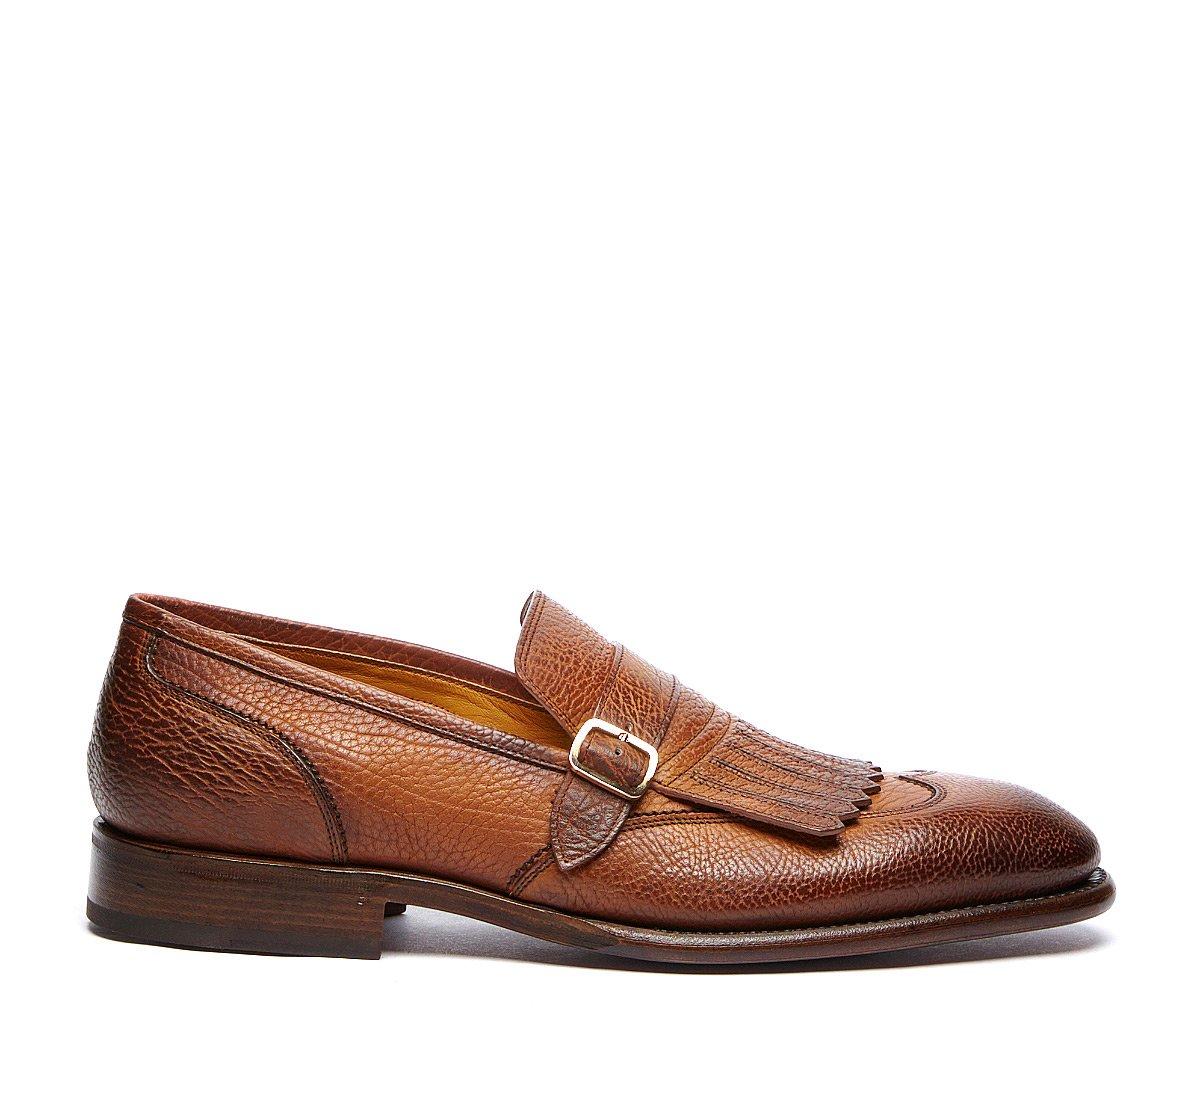 Fabi Flex Goodyear monk shoes